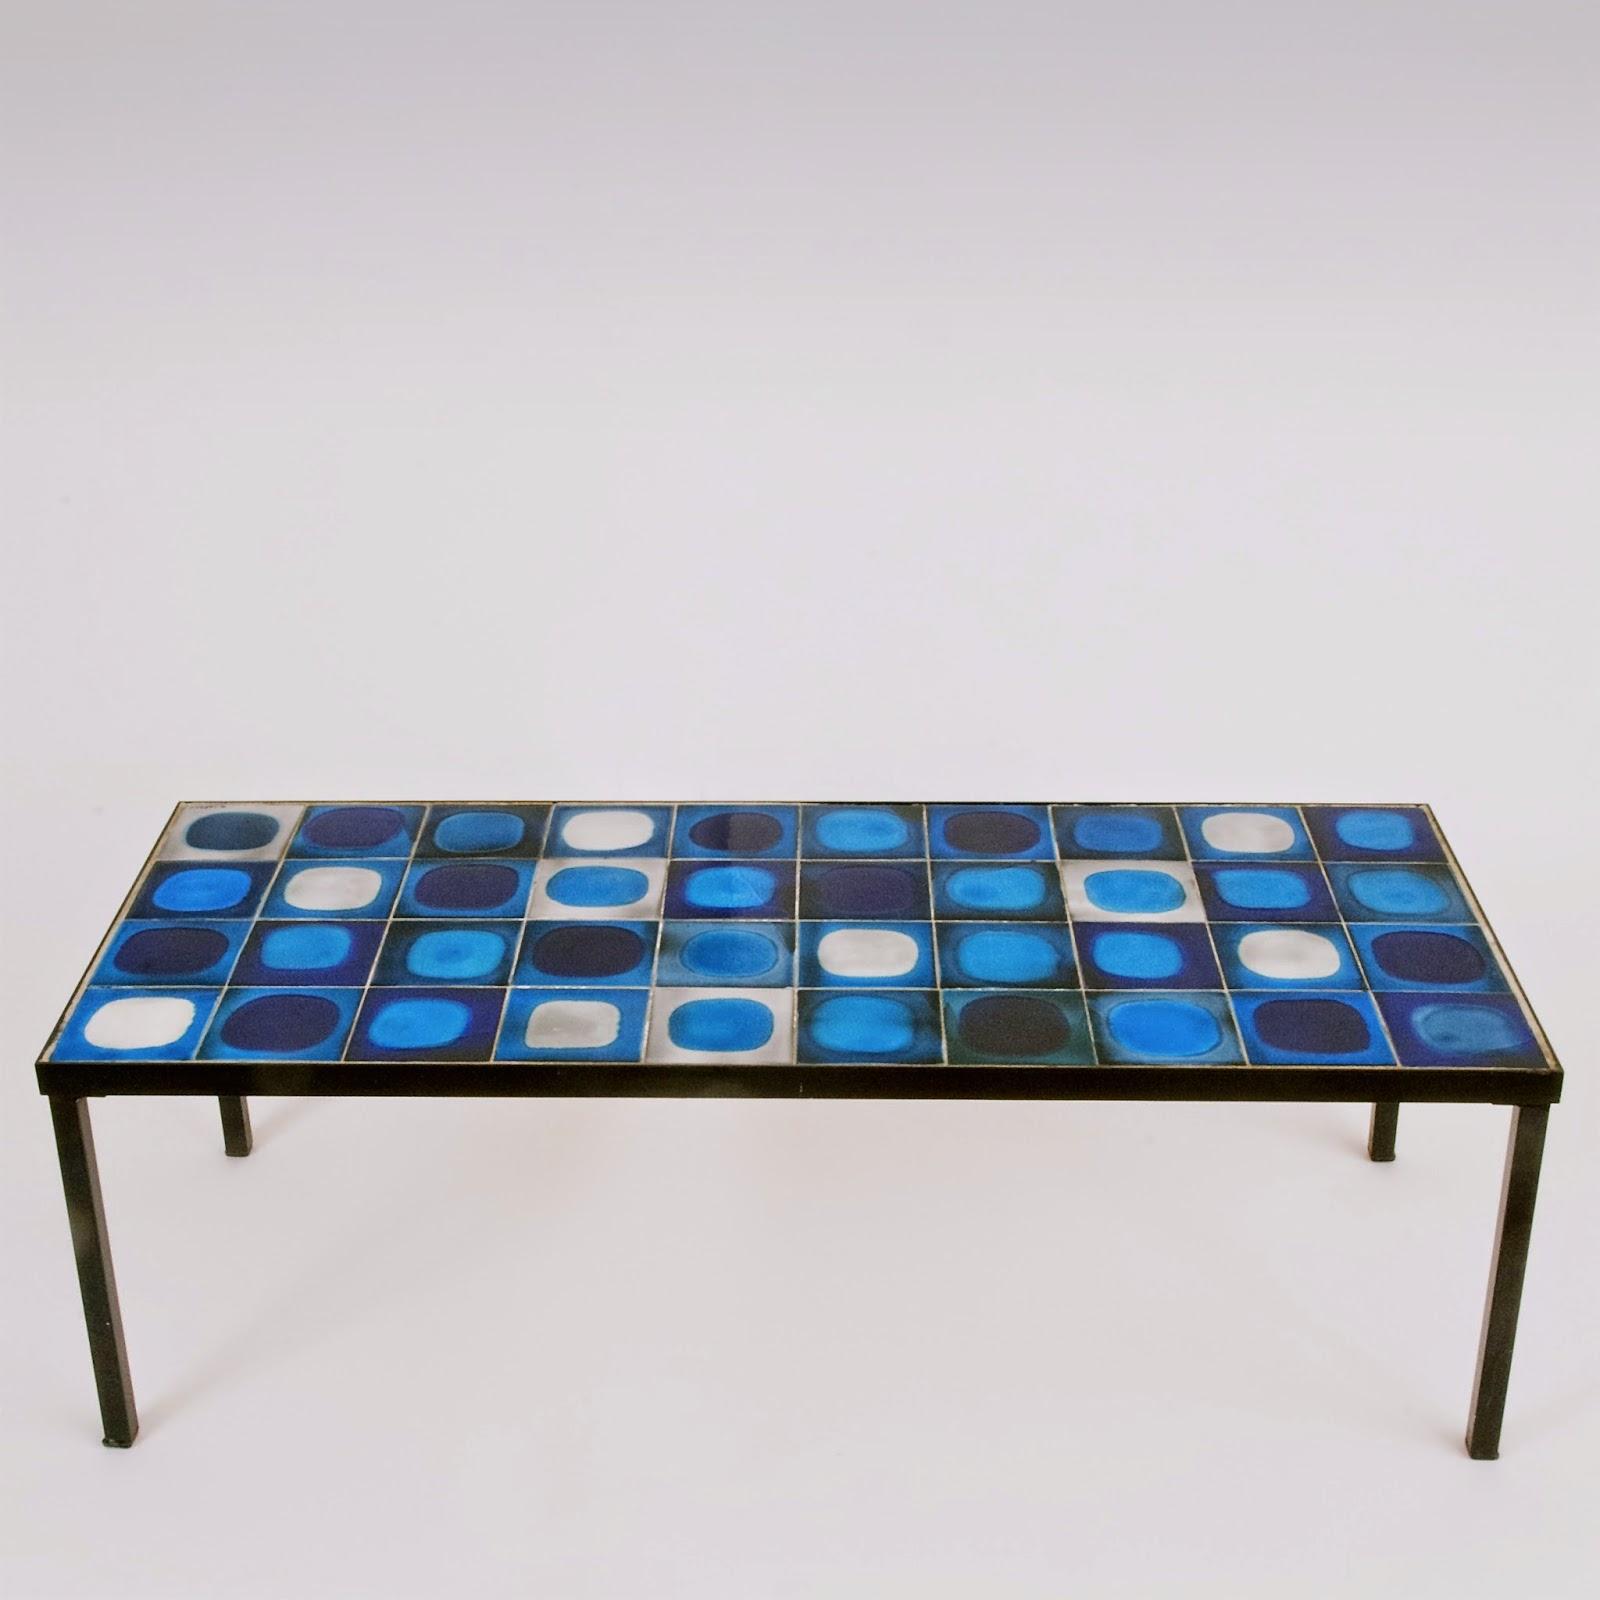 galerie riviera roger capron table basse plan tes bleue. Black Bedroom Furniture Sets. Home Design Ideas